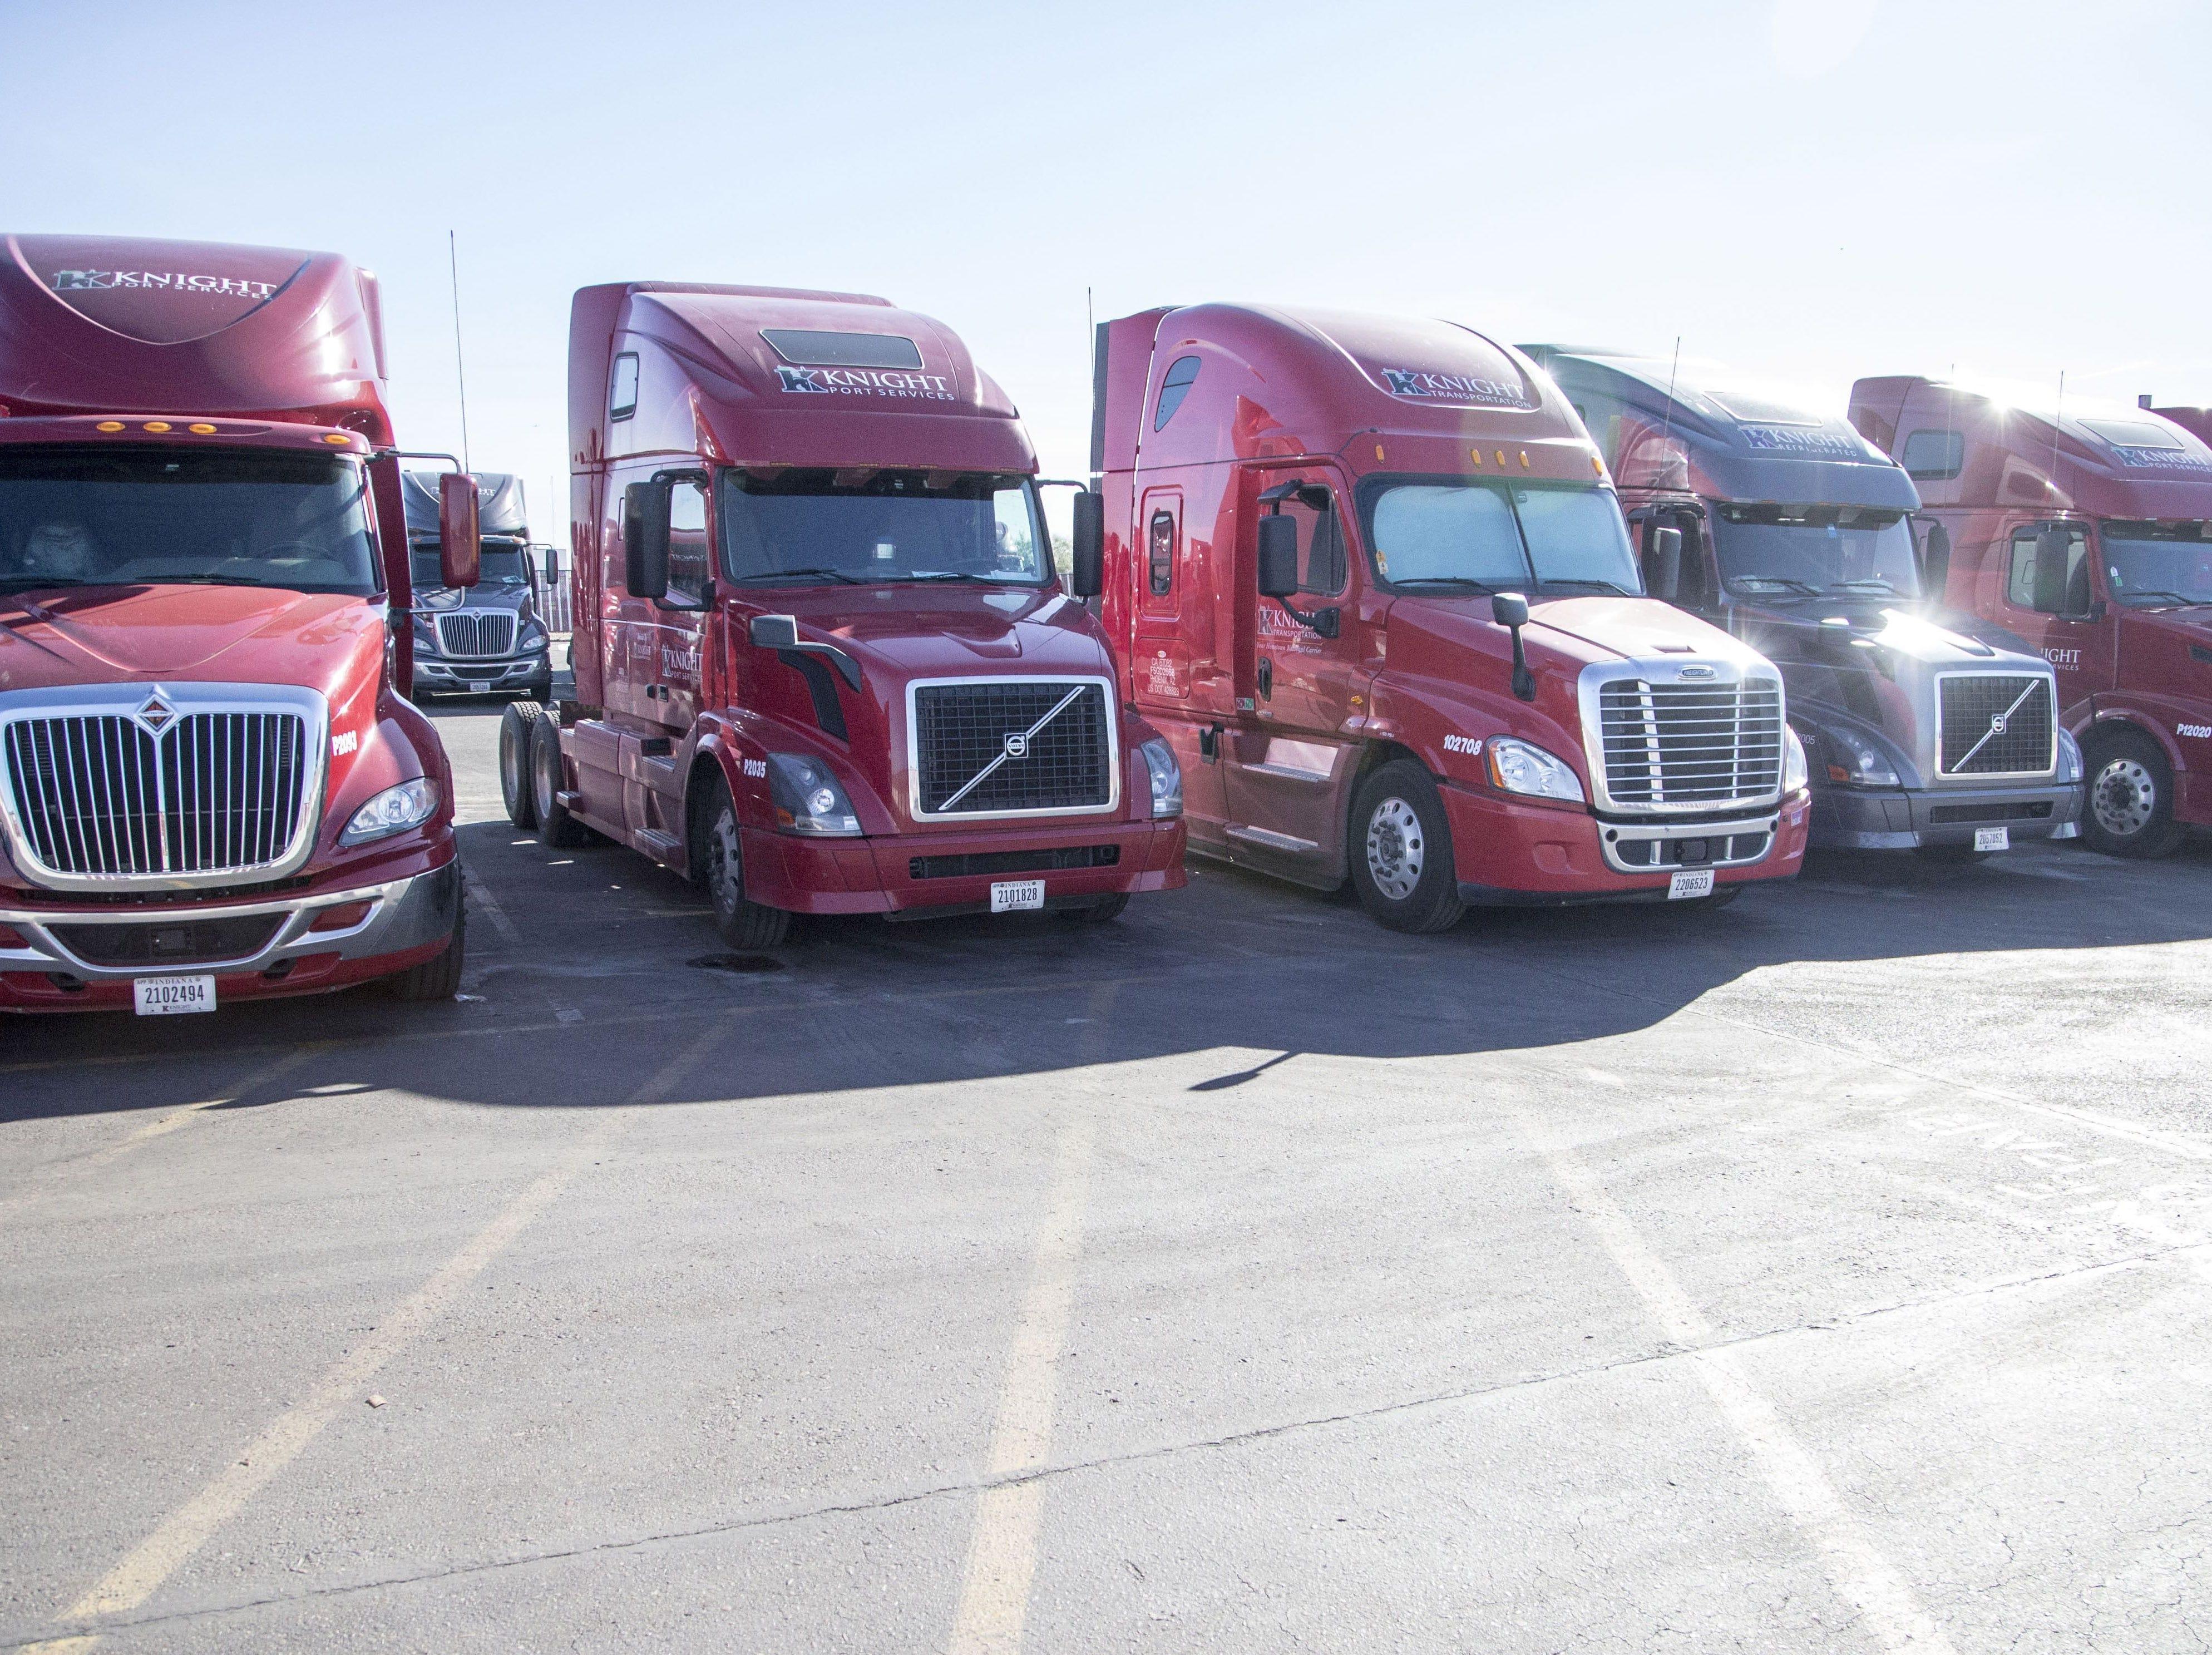 No. 50:  Knight-Swift Transportation | Trucking, transportation services | 2019 employees: 3,500 | 2018 employees: 3,400e (estimated by Arizona Republic) | Ownership: Public | Headquarters: Phoenix | www.knight-swift.com